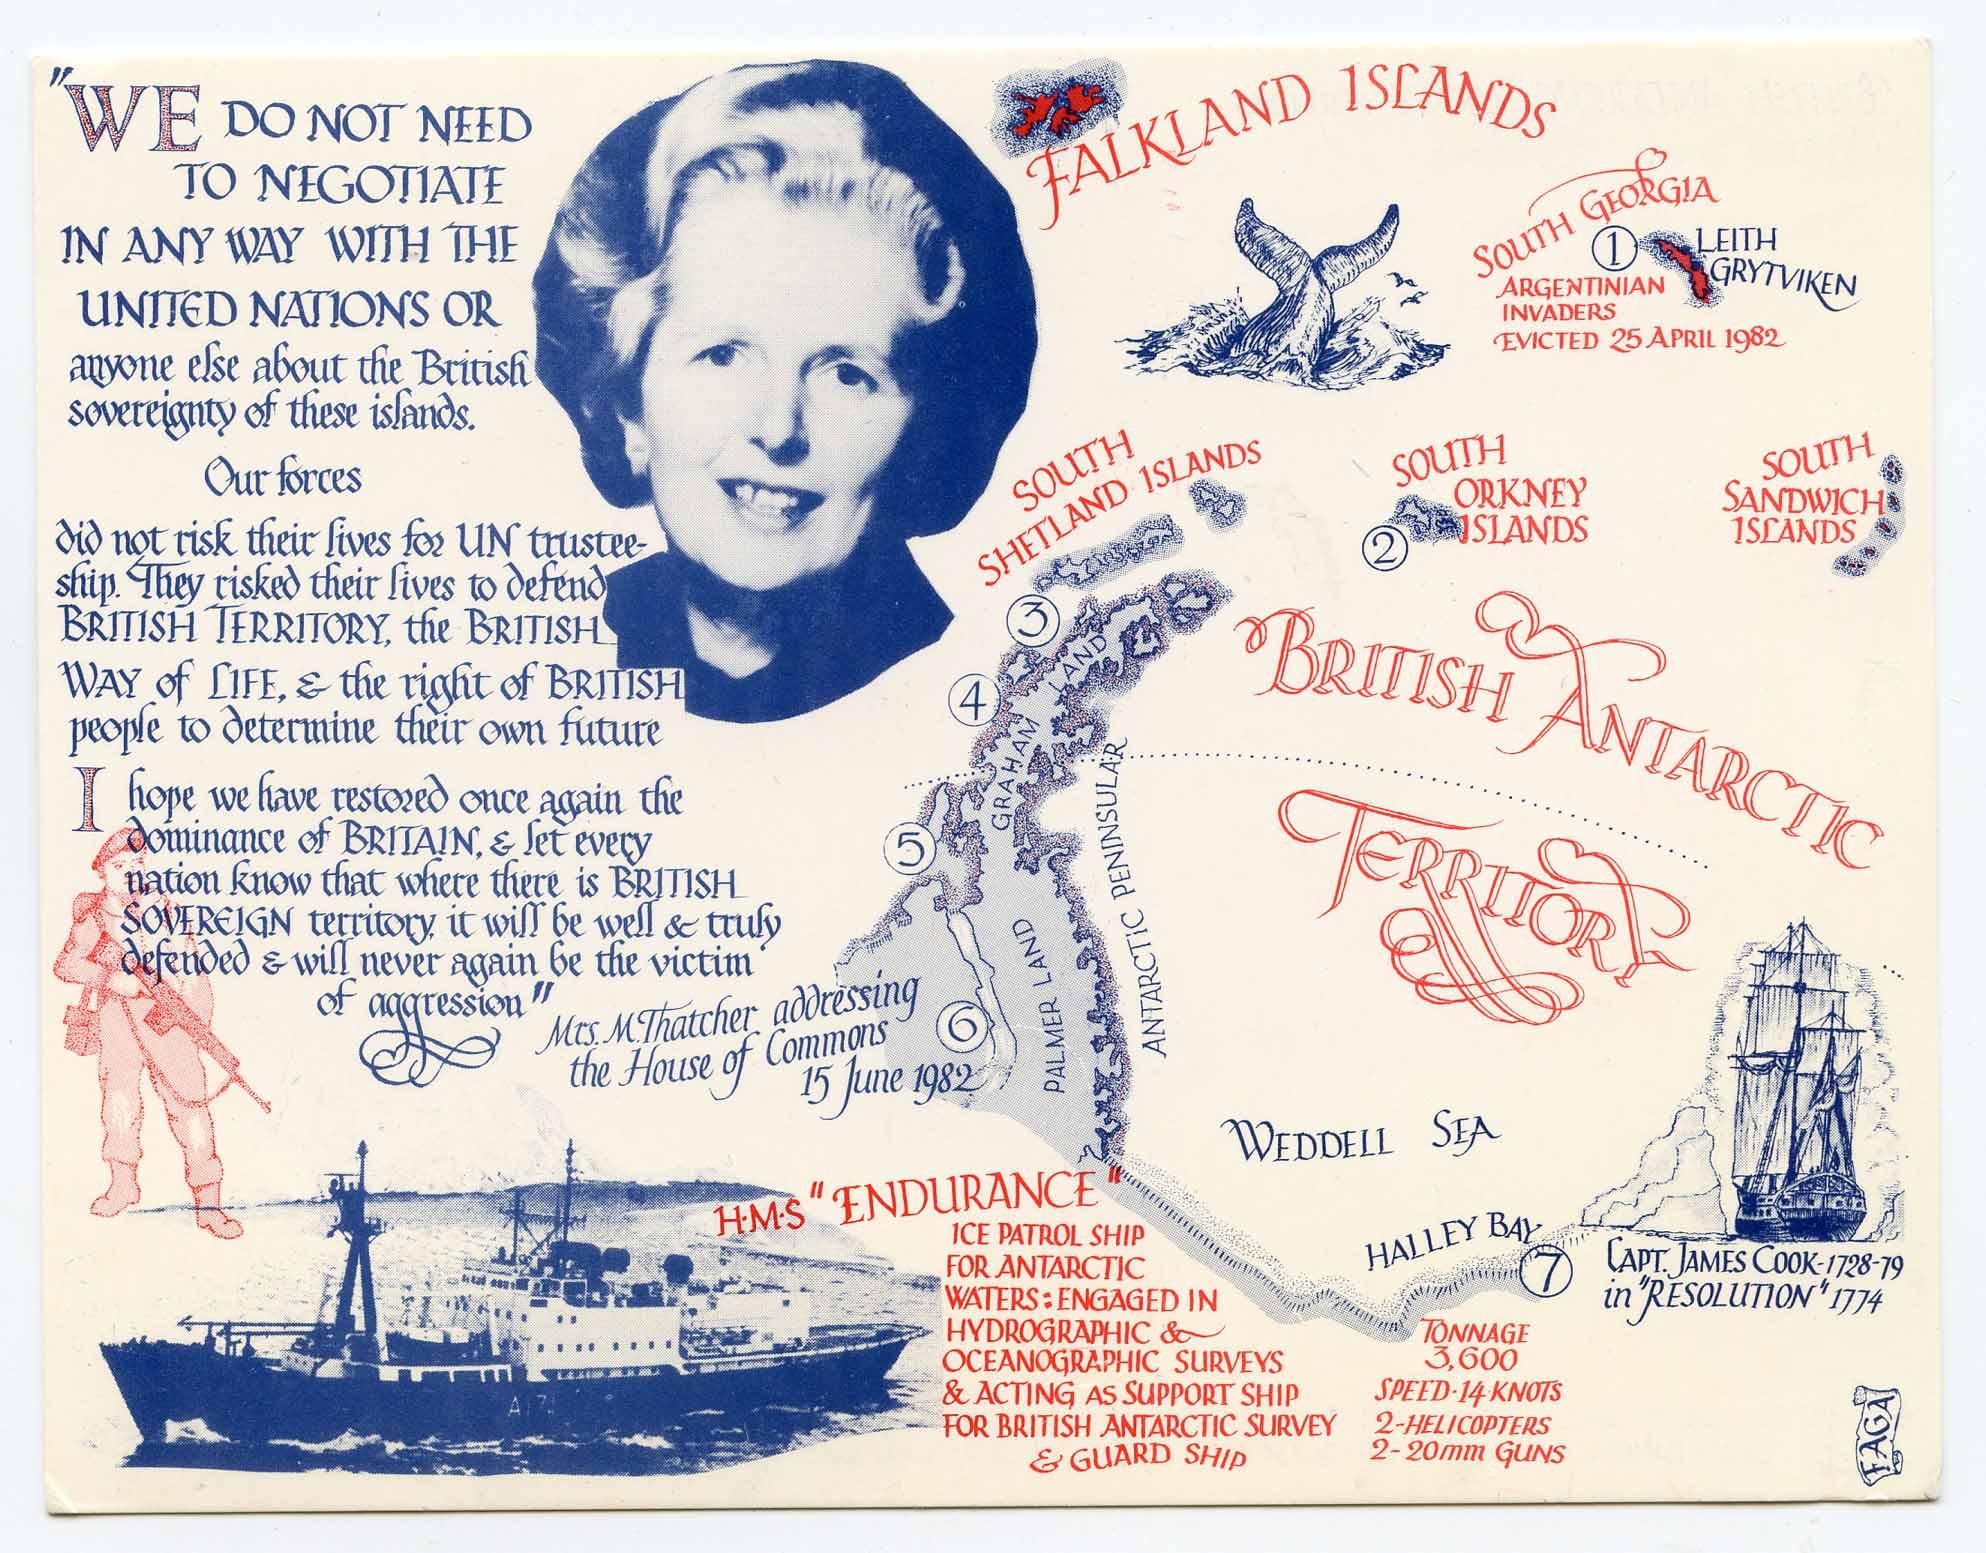 Galklands postcard